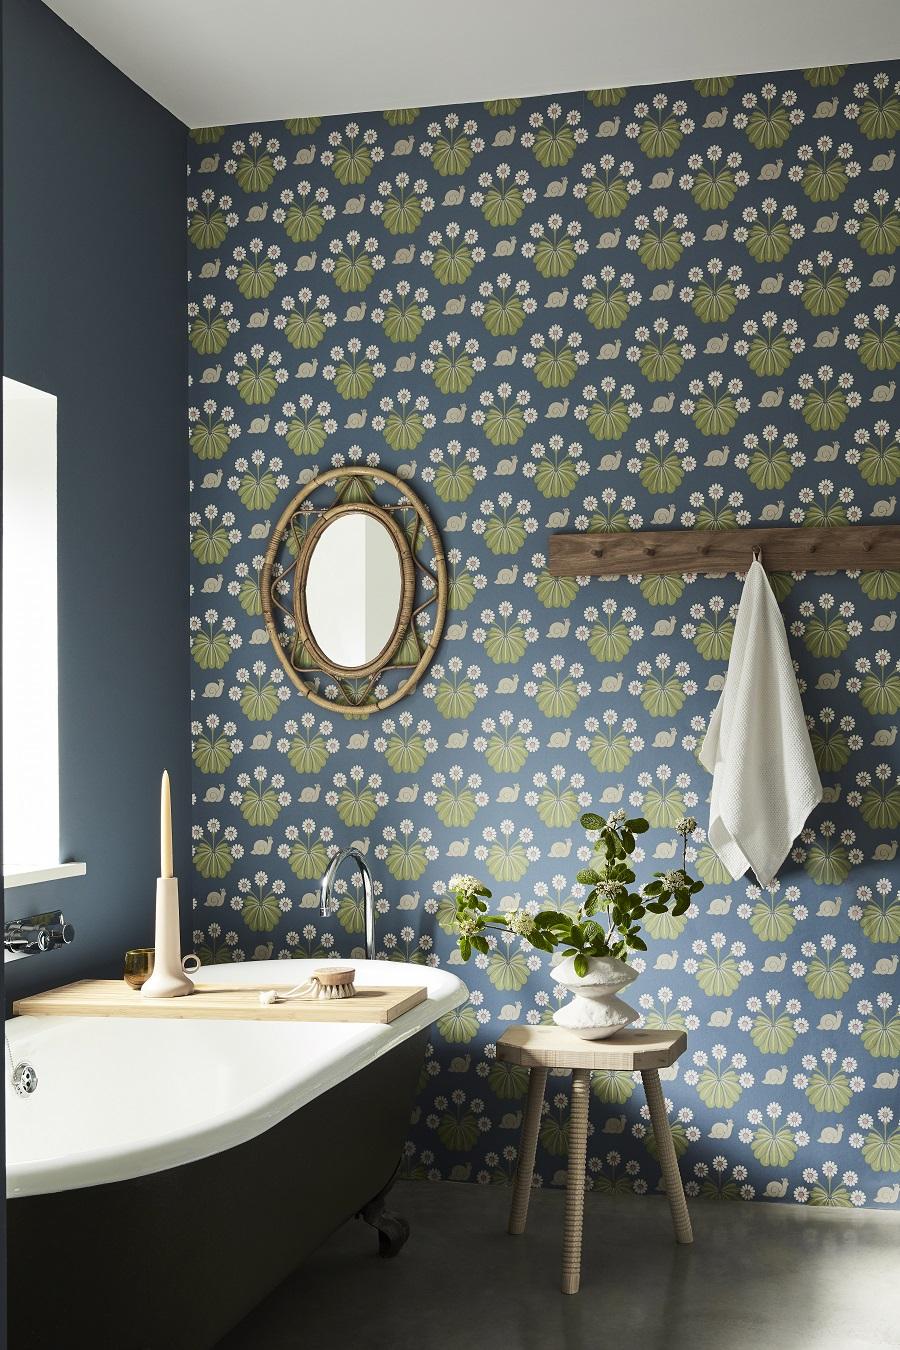 A Celebration of Enduring Wallpaper Design From Little Greene